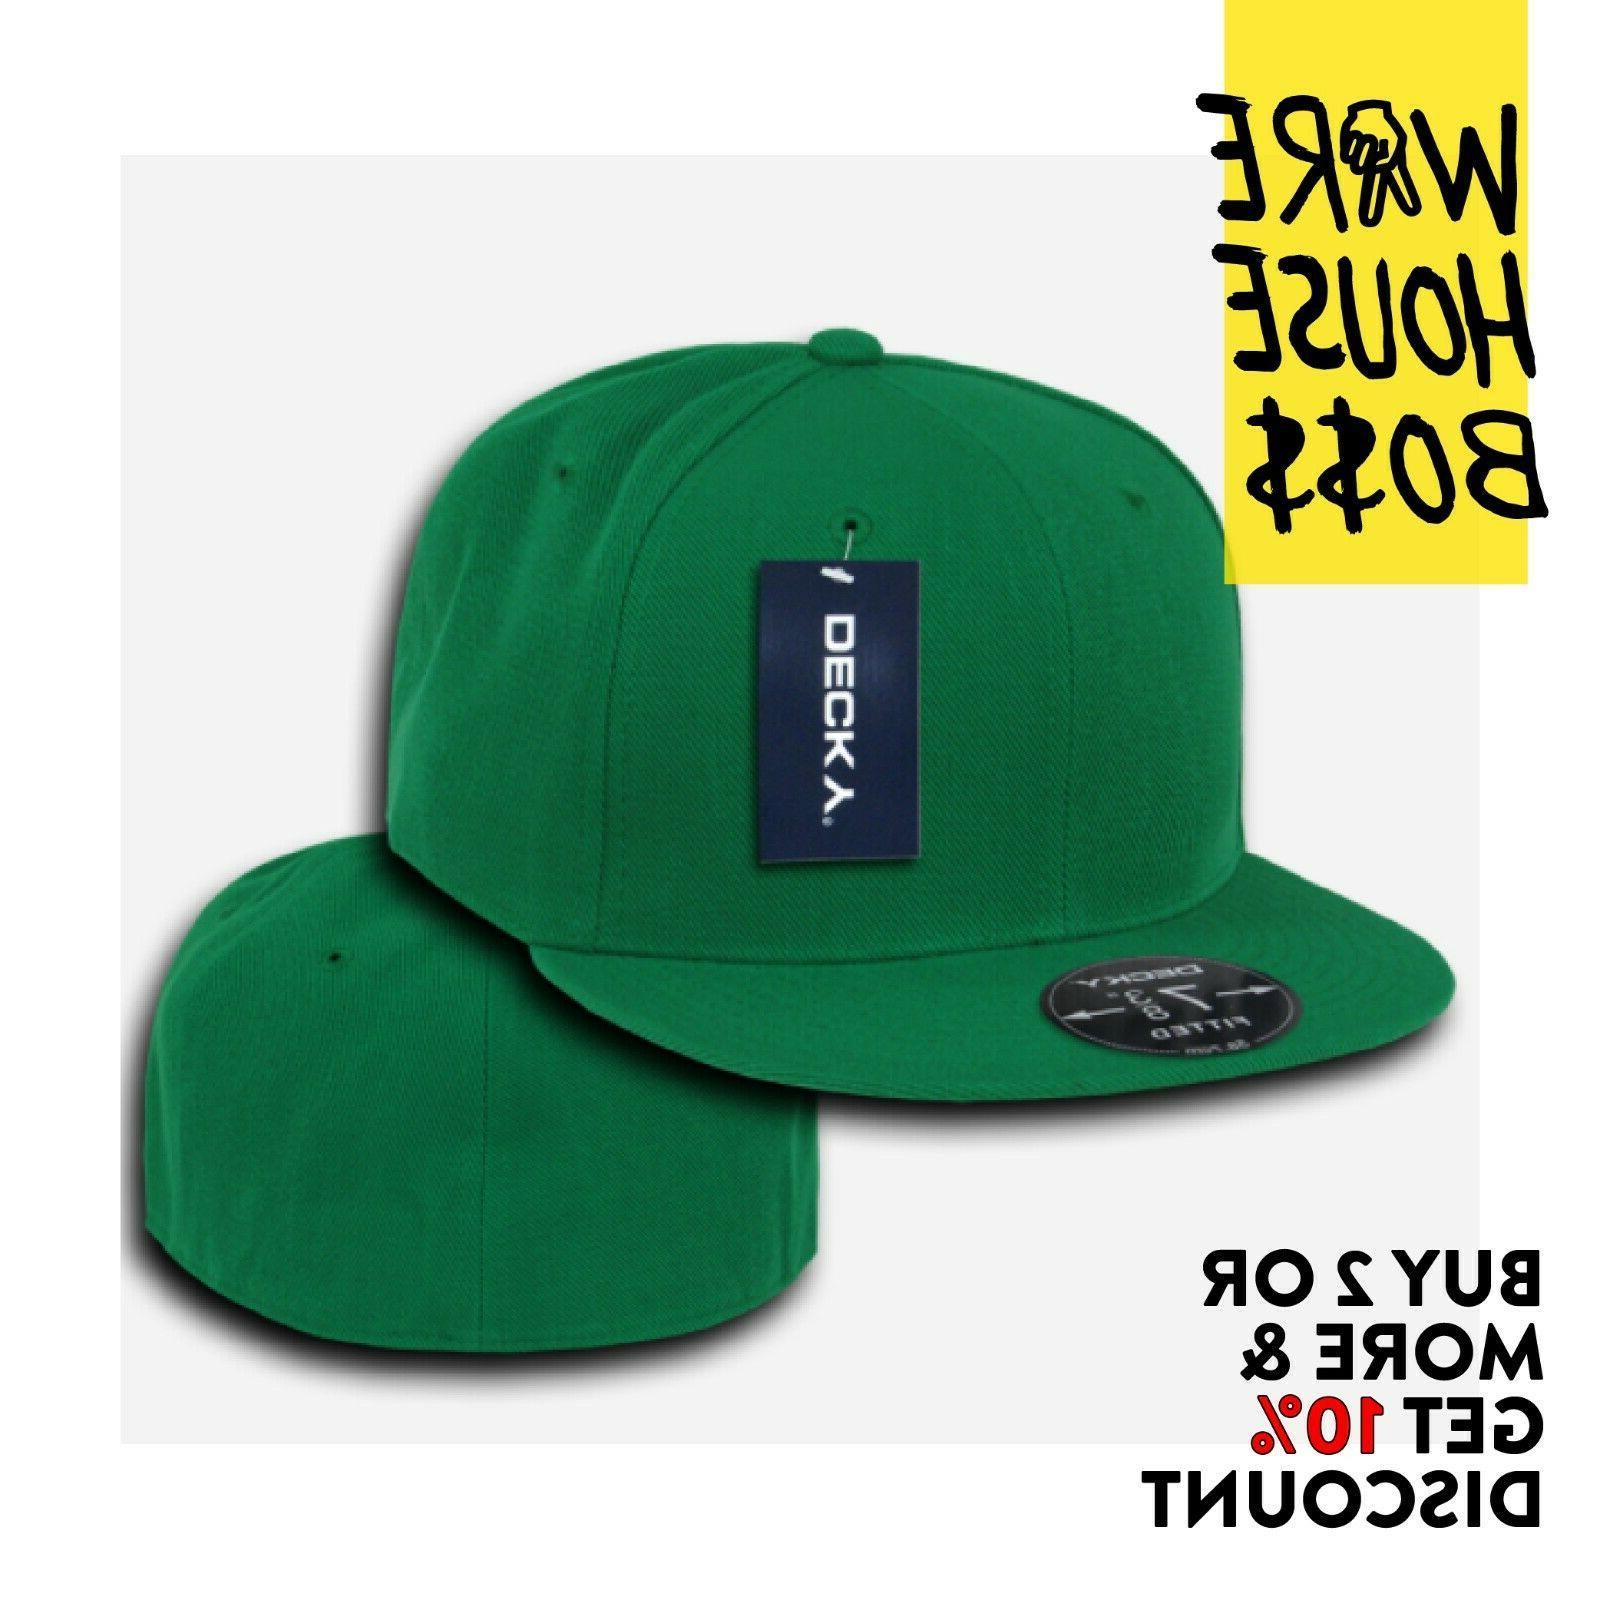 DECKY HAT BILL HATS BASIC CAPS